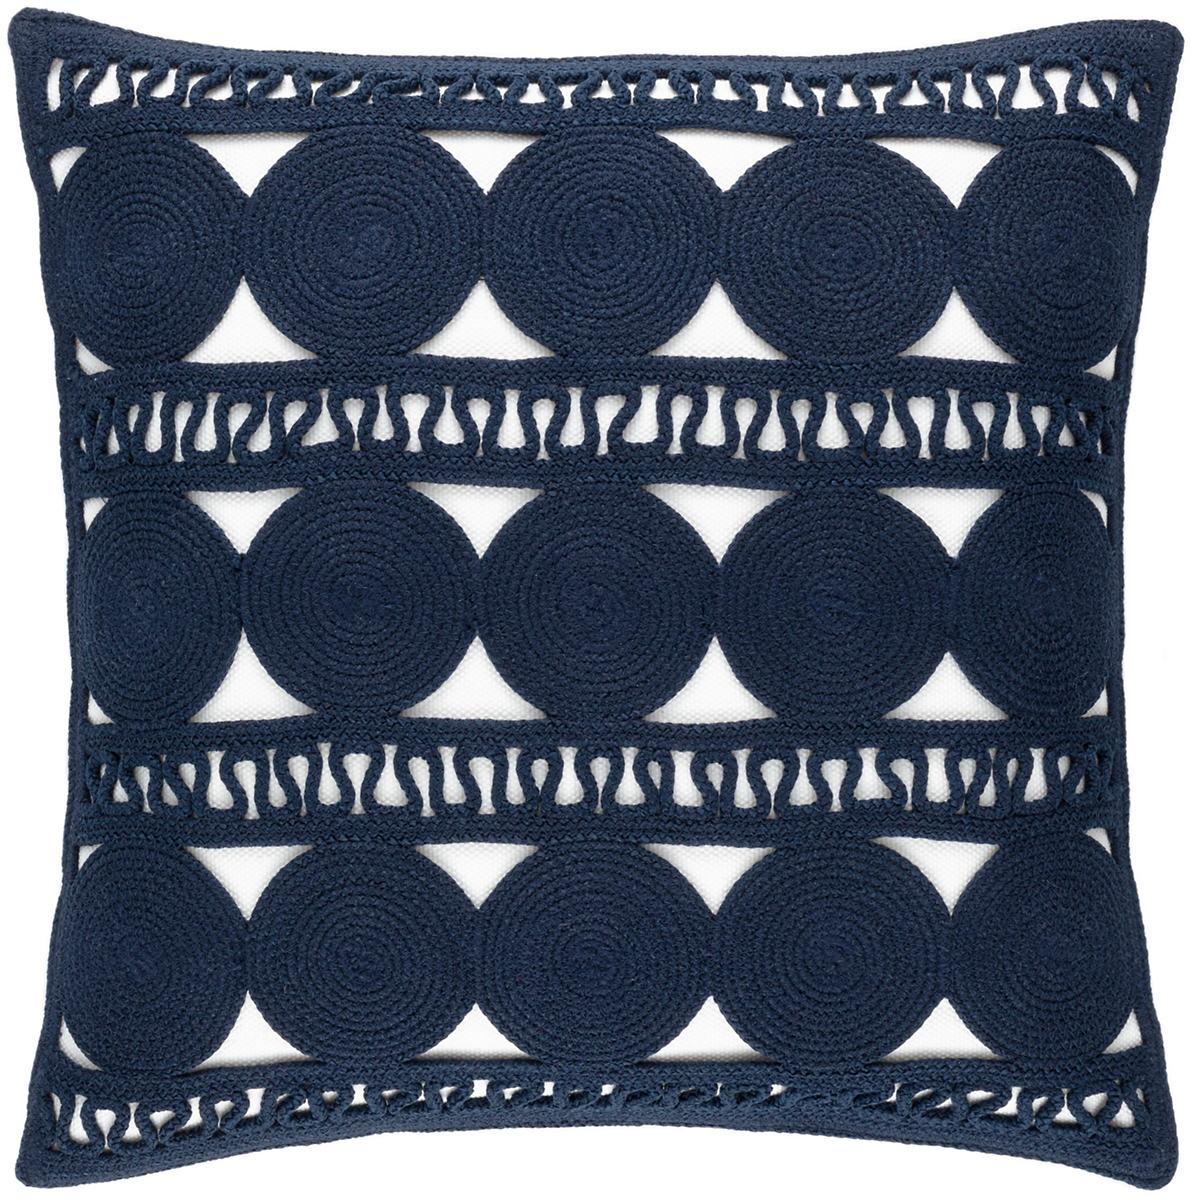 Round Turn Navy Indoor/Outdoor Decorative Pillow